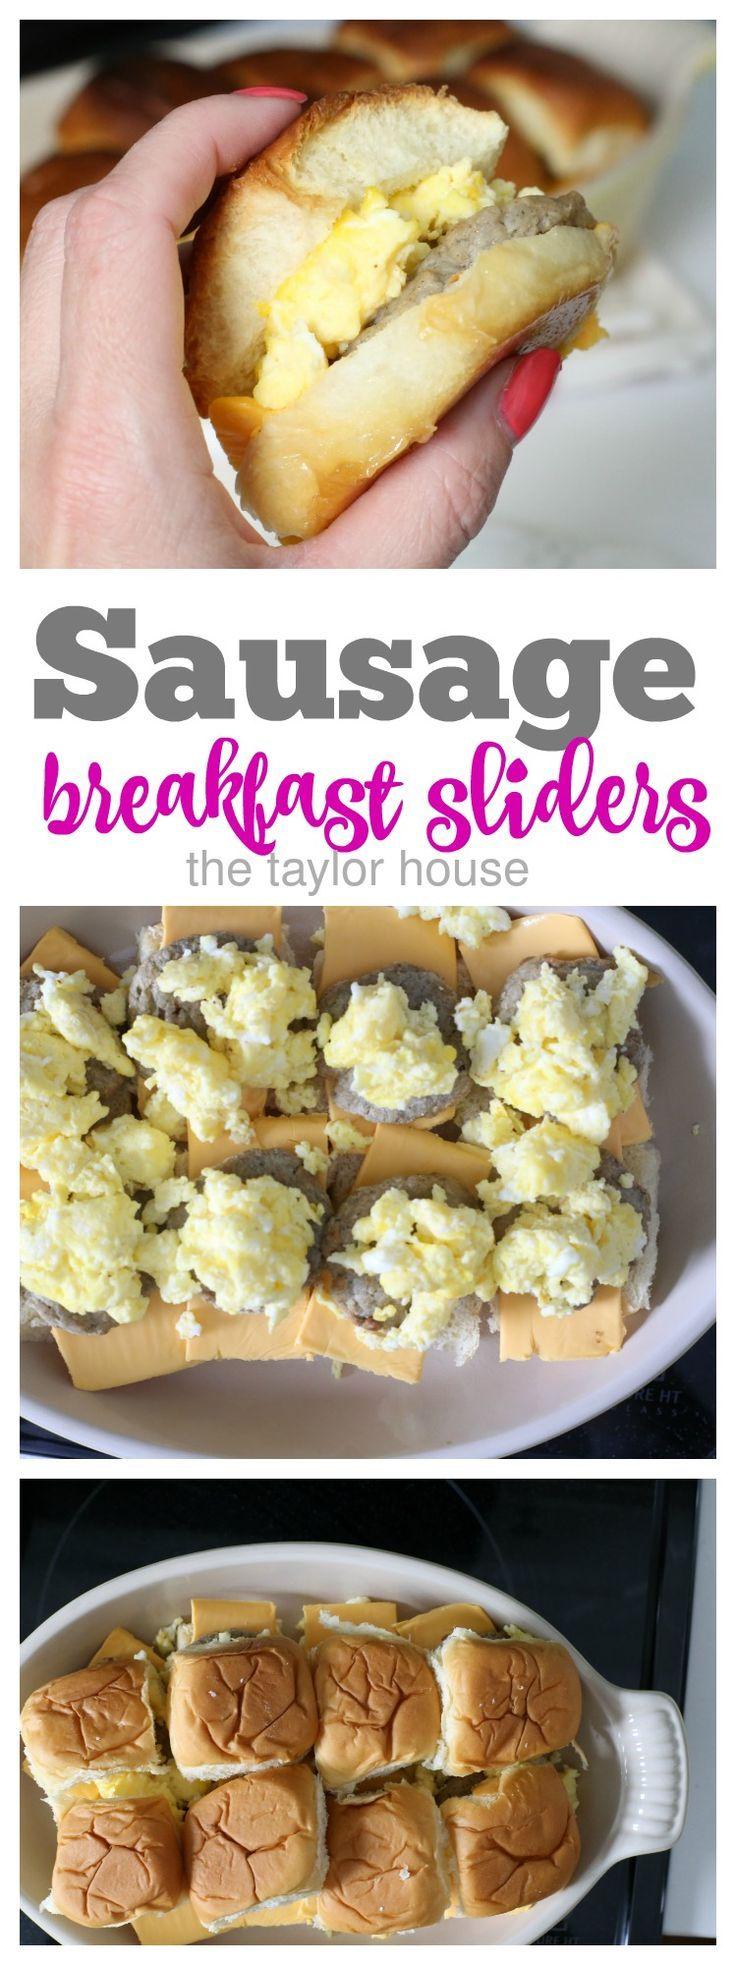 Sausage Breakfast Sandwich Sliders